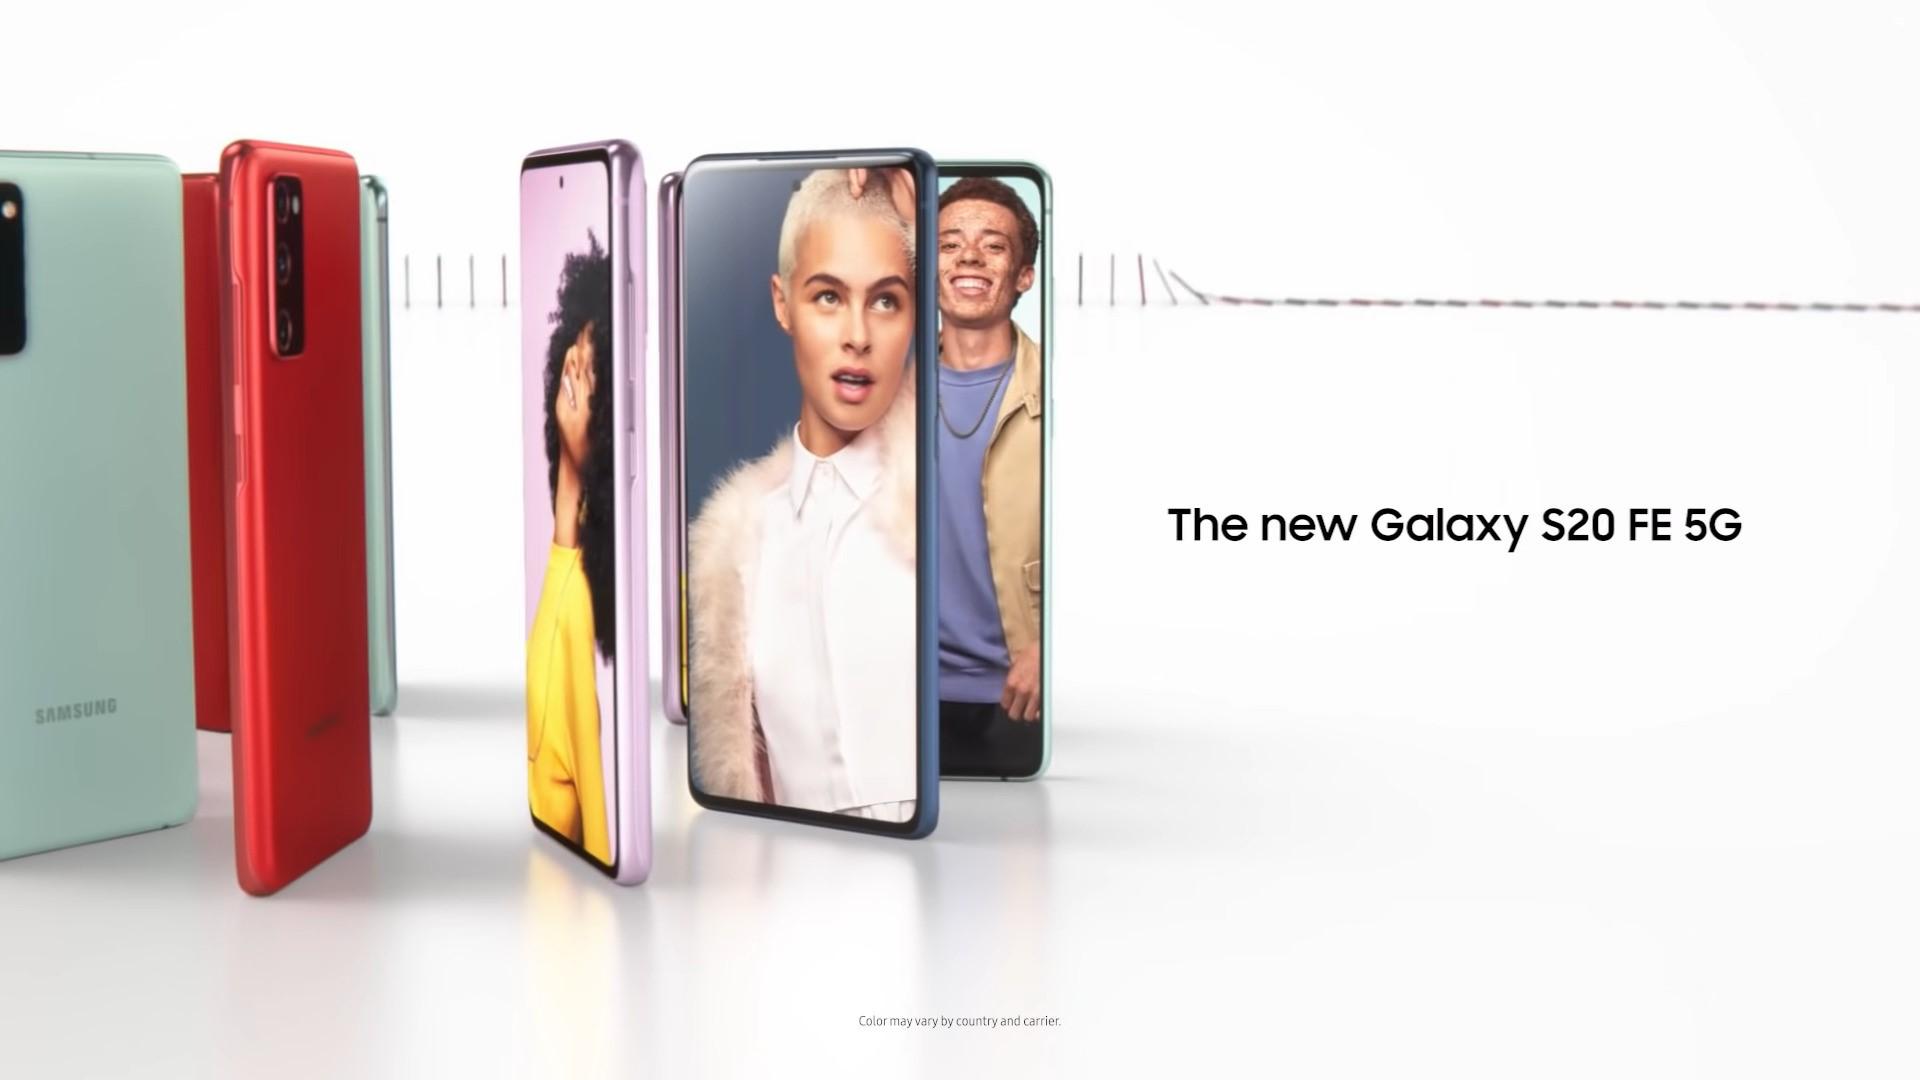 Samsung,Samsung Galaxy S20 FE,#S20FE,#GalaxyS20FE,Ratgeber,Tipps,Tricks,Hilfe,FAQ,Anleitungen,...jpg